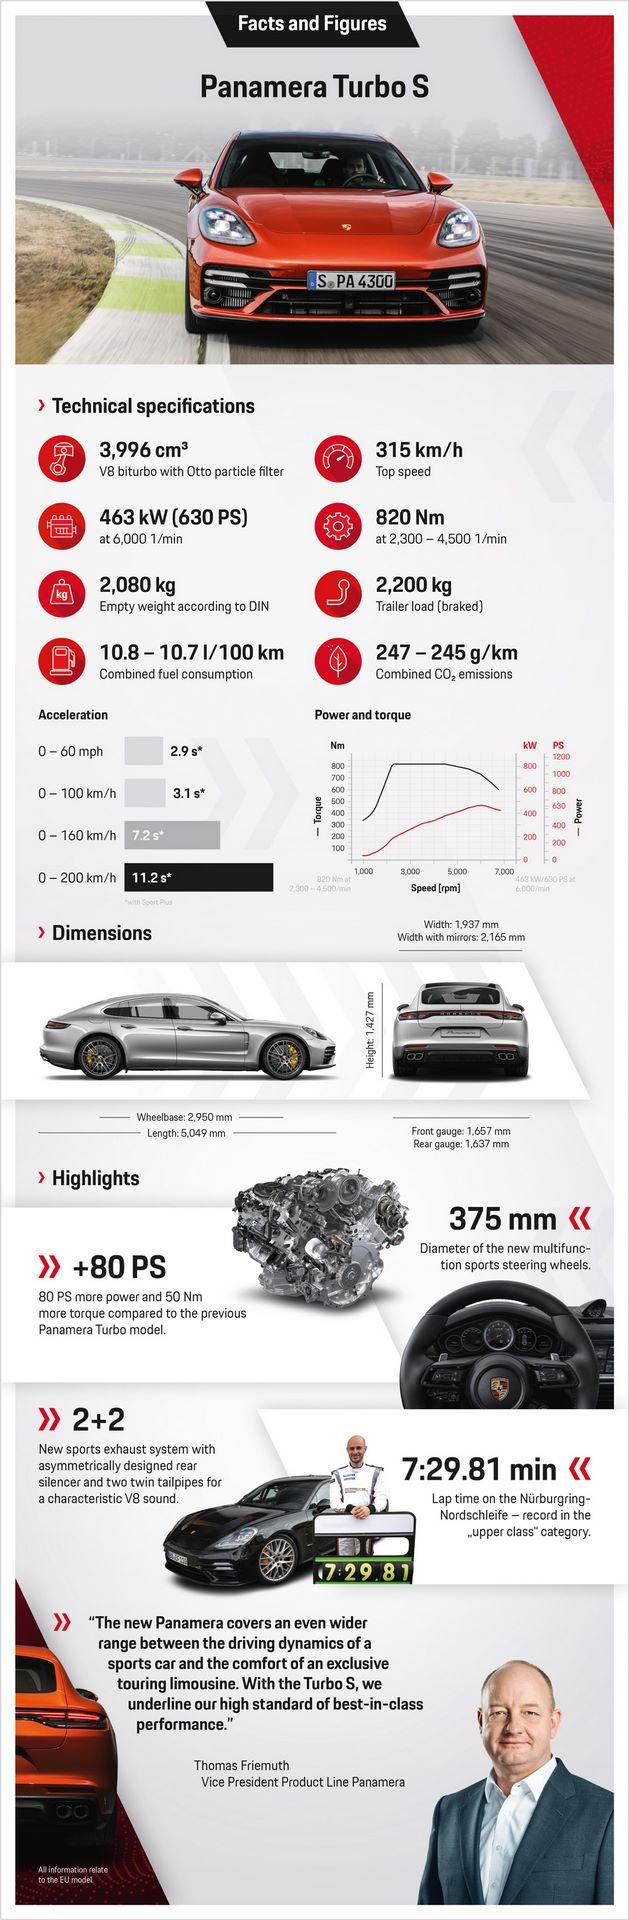 2020.08.24_PORSCHE_Infografik_Panamera_G_II_Turbo_S_EN_v6.indd